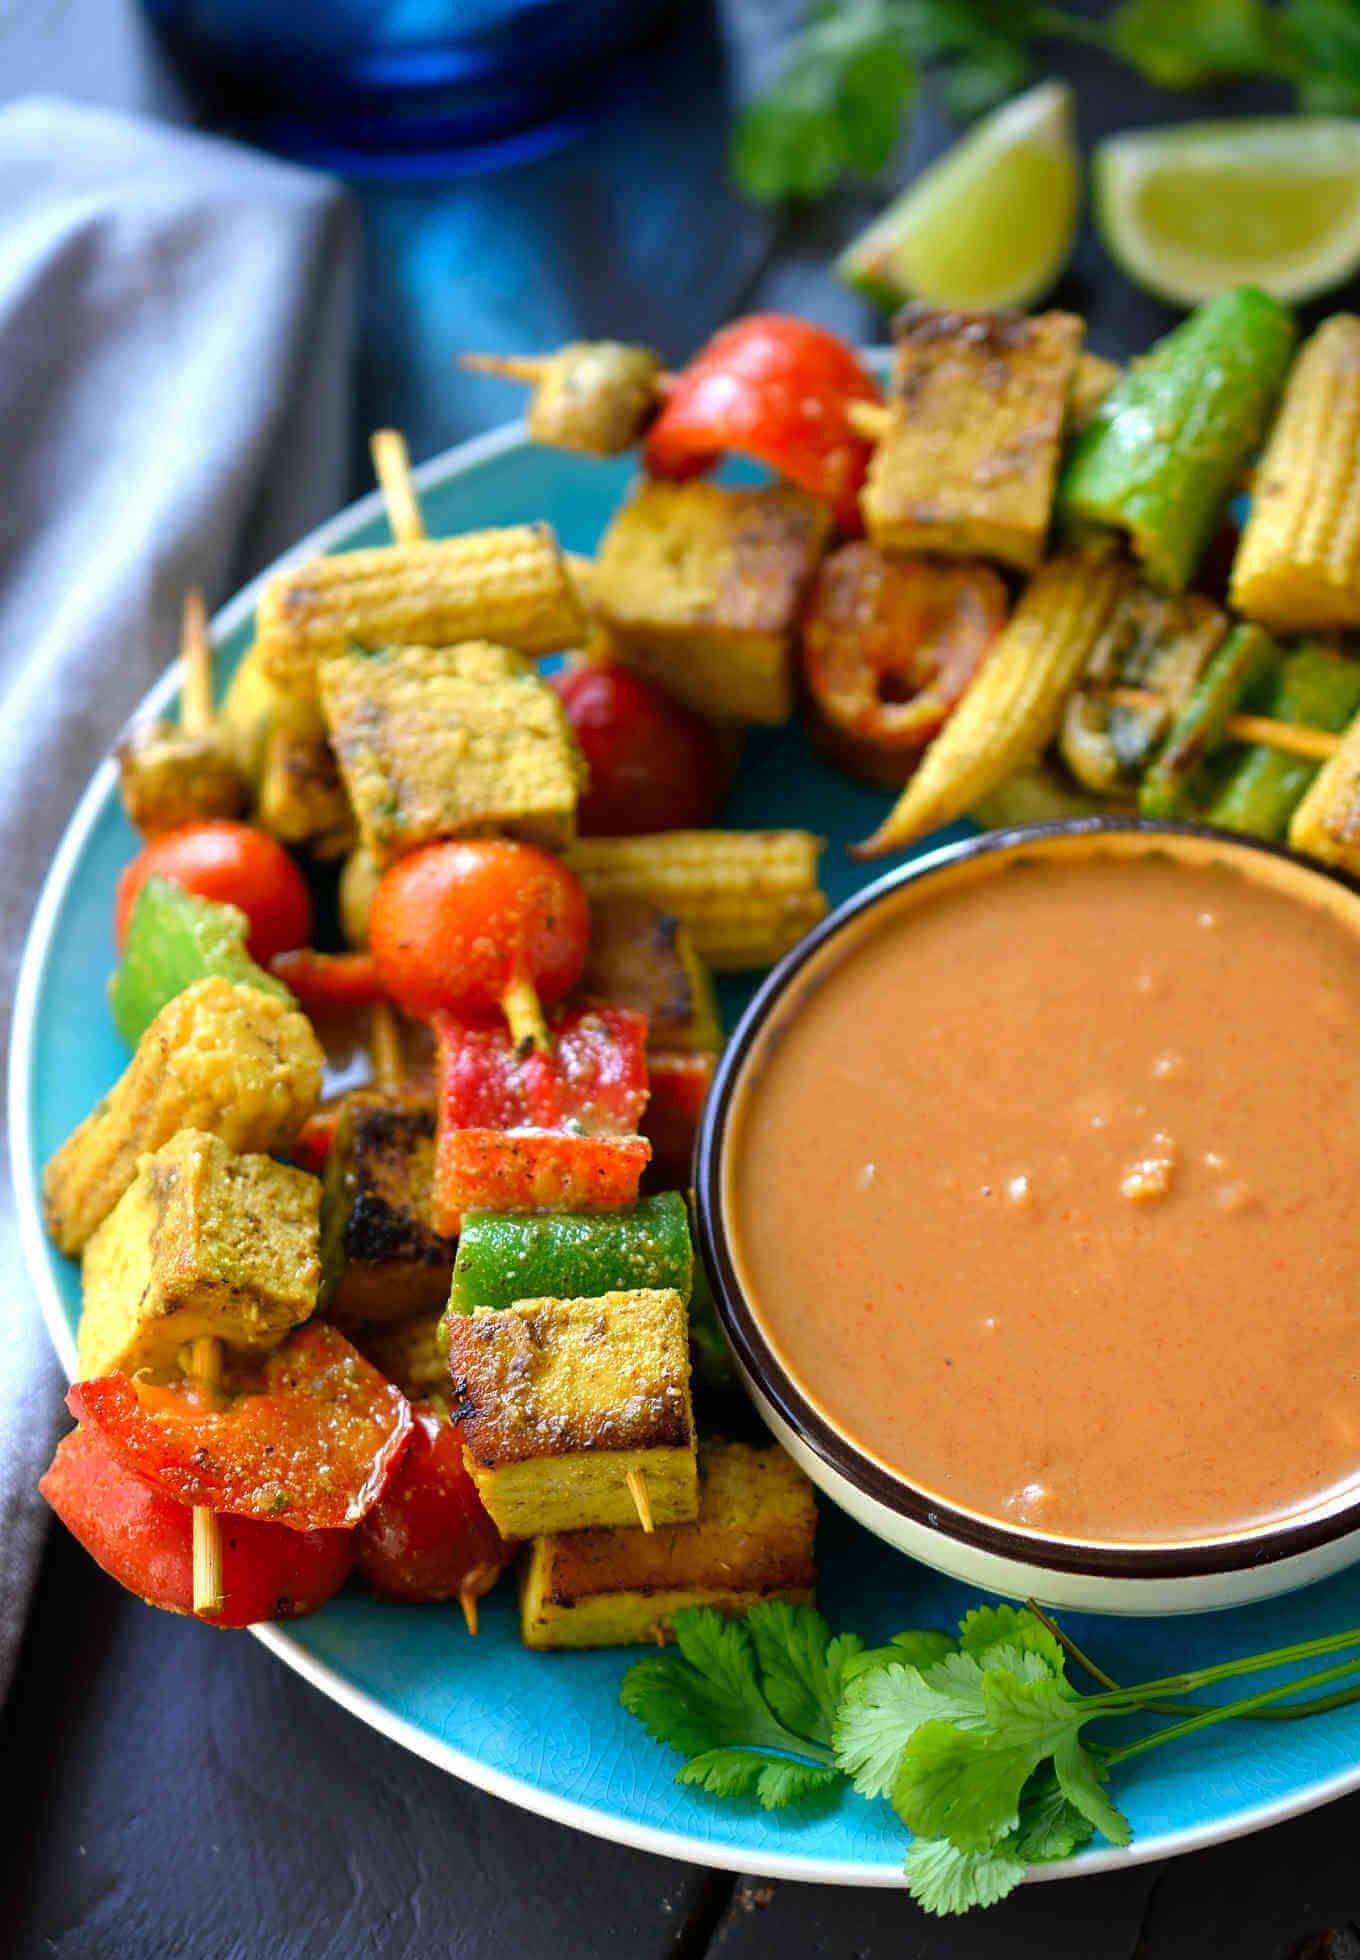 27 Delish Vegan 4th Of July Recipes And Menu Ideas Vegan